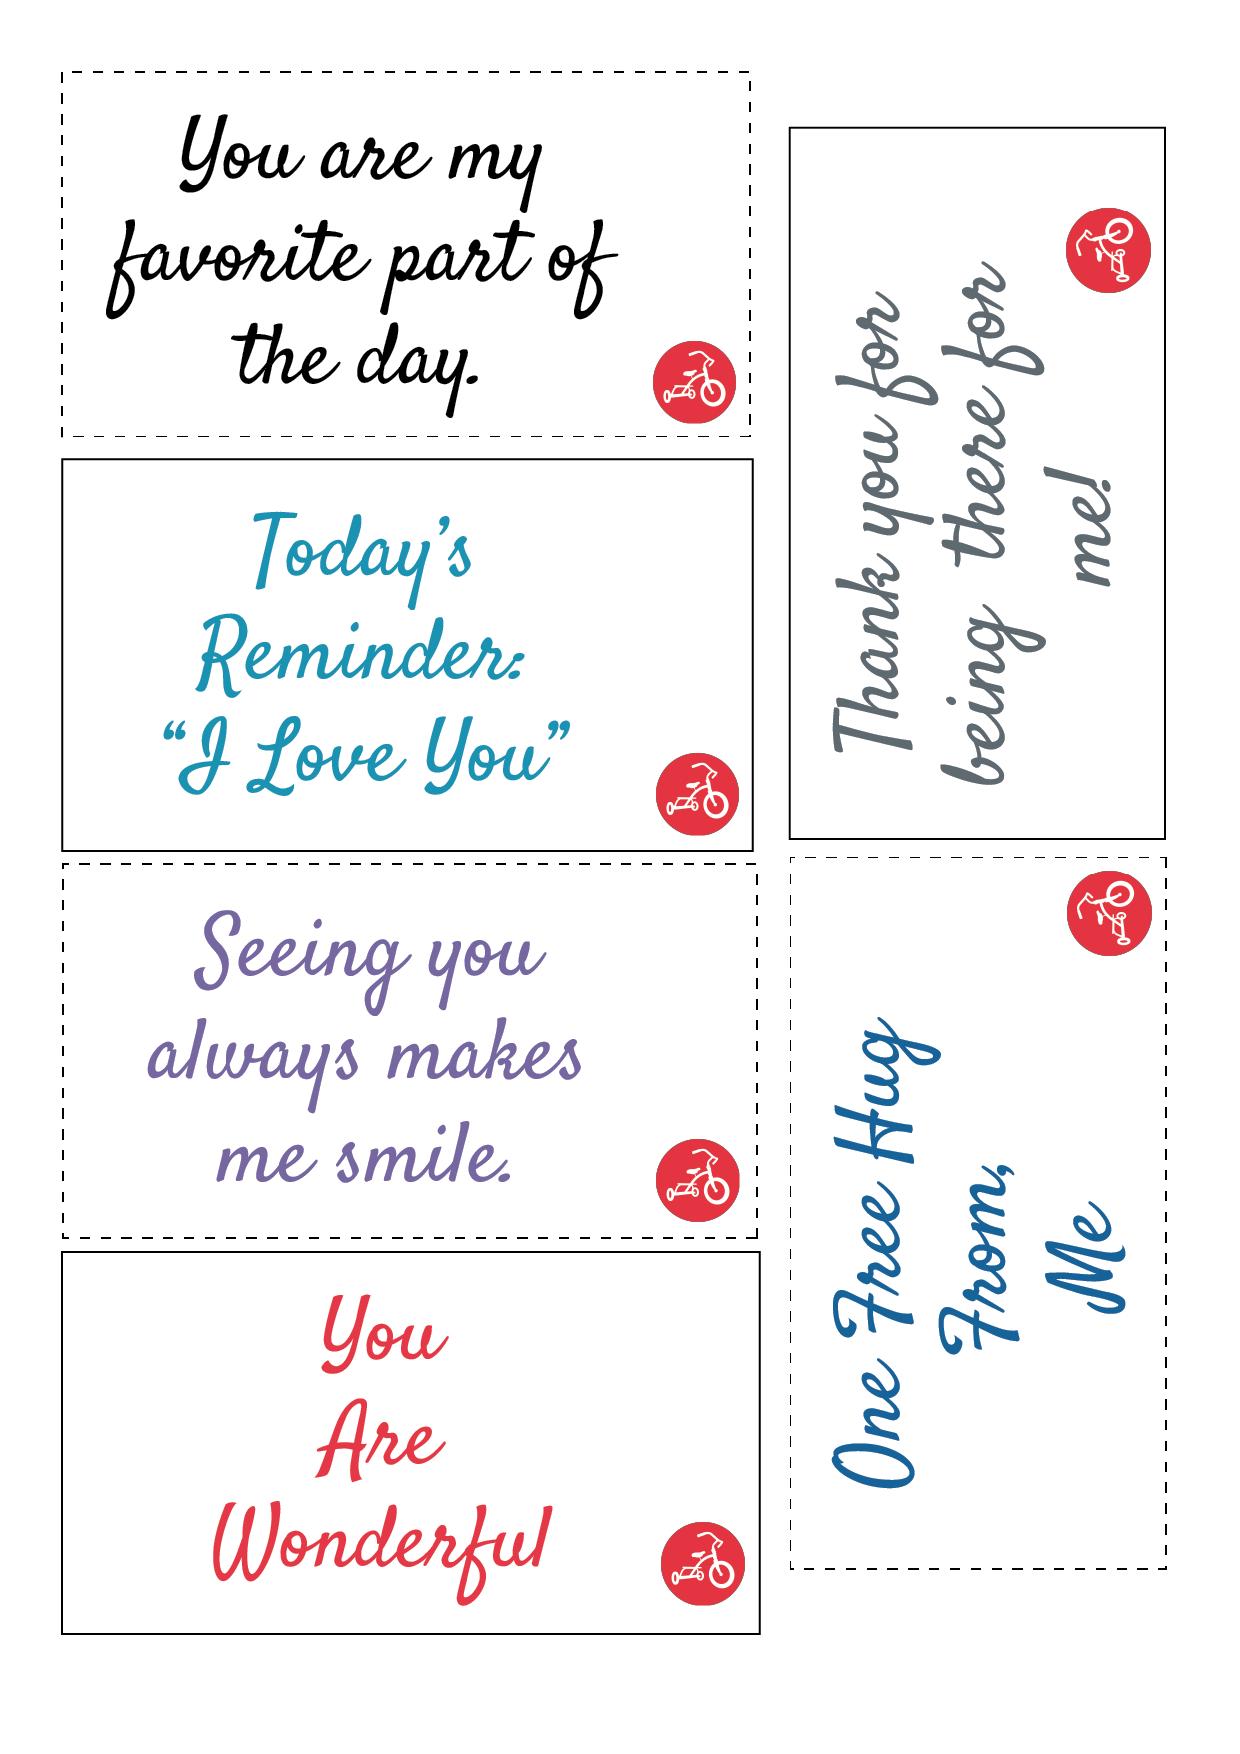 Kindness-Card-01-01